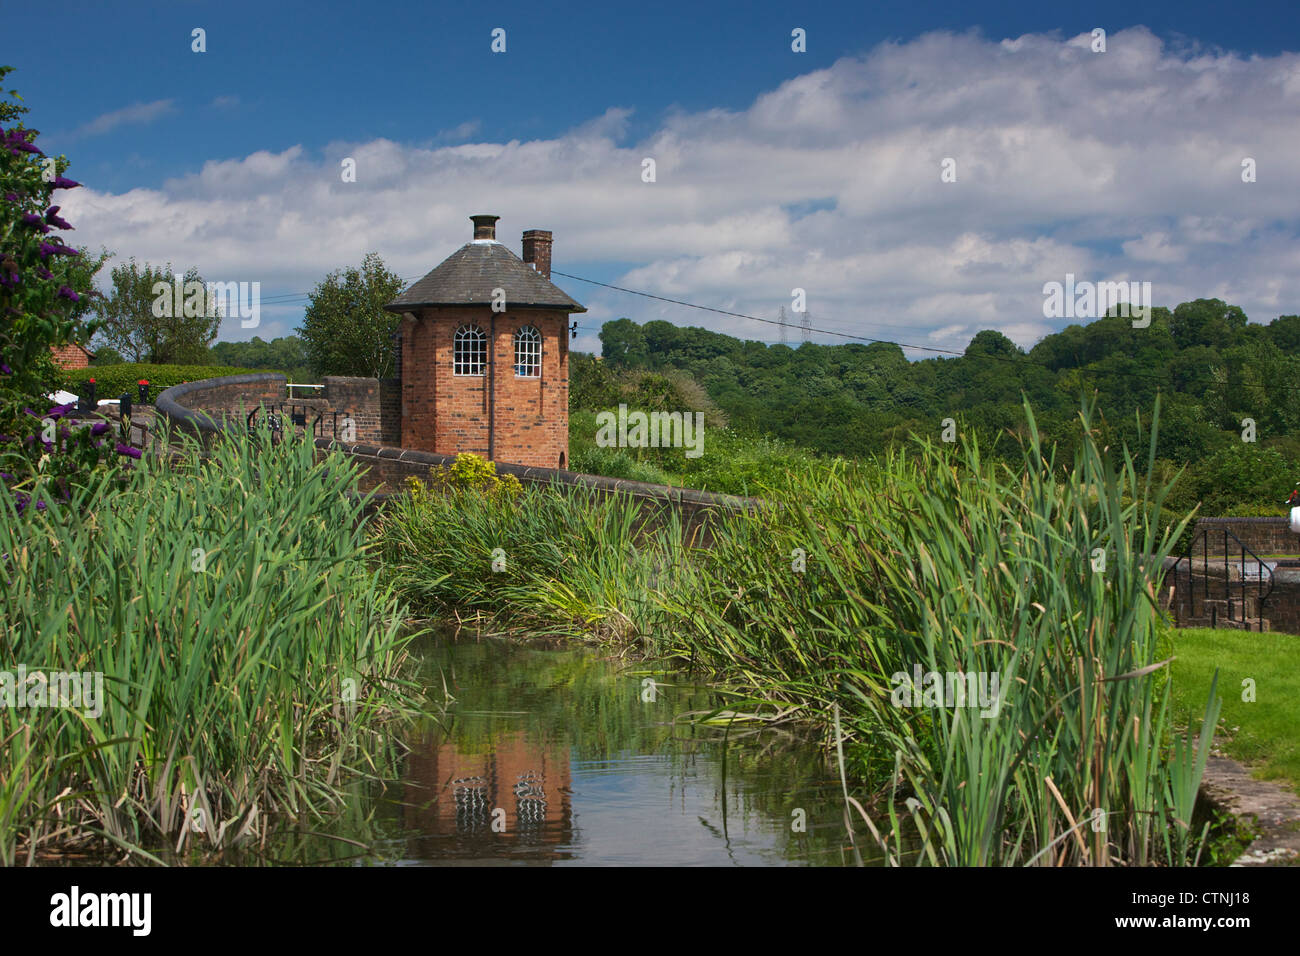 Bratch Locks Toll House Wombourne South Staffordshire England UK - Stock Image